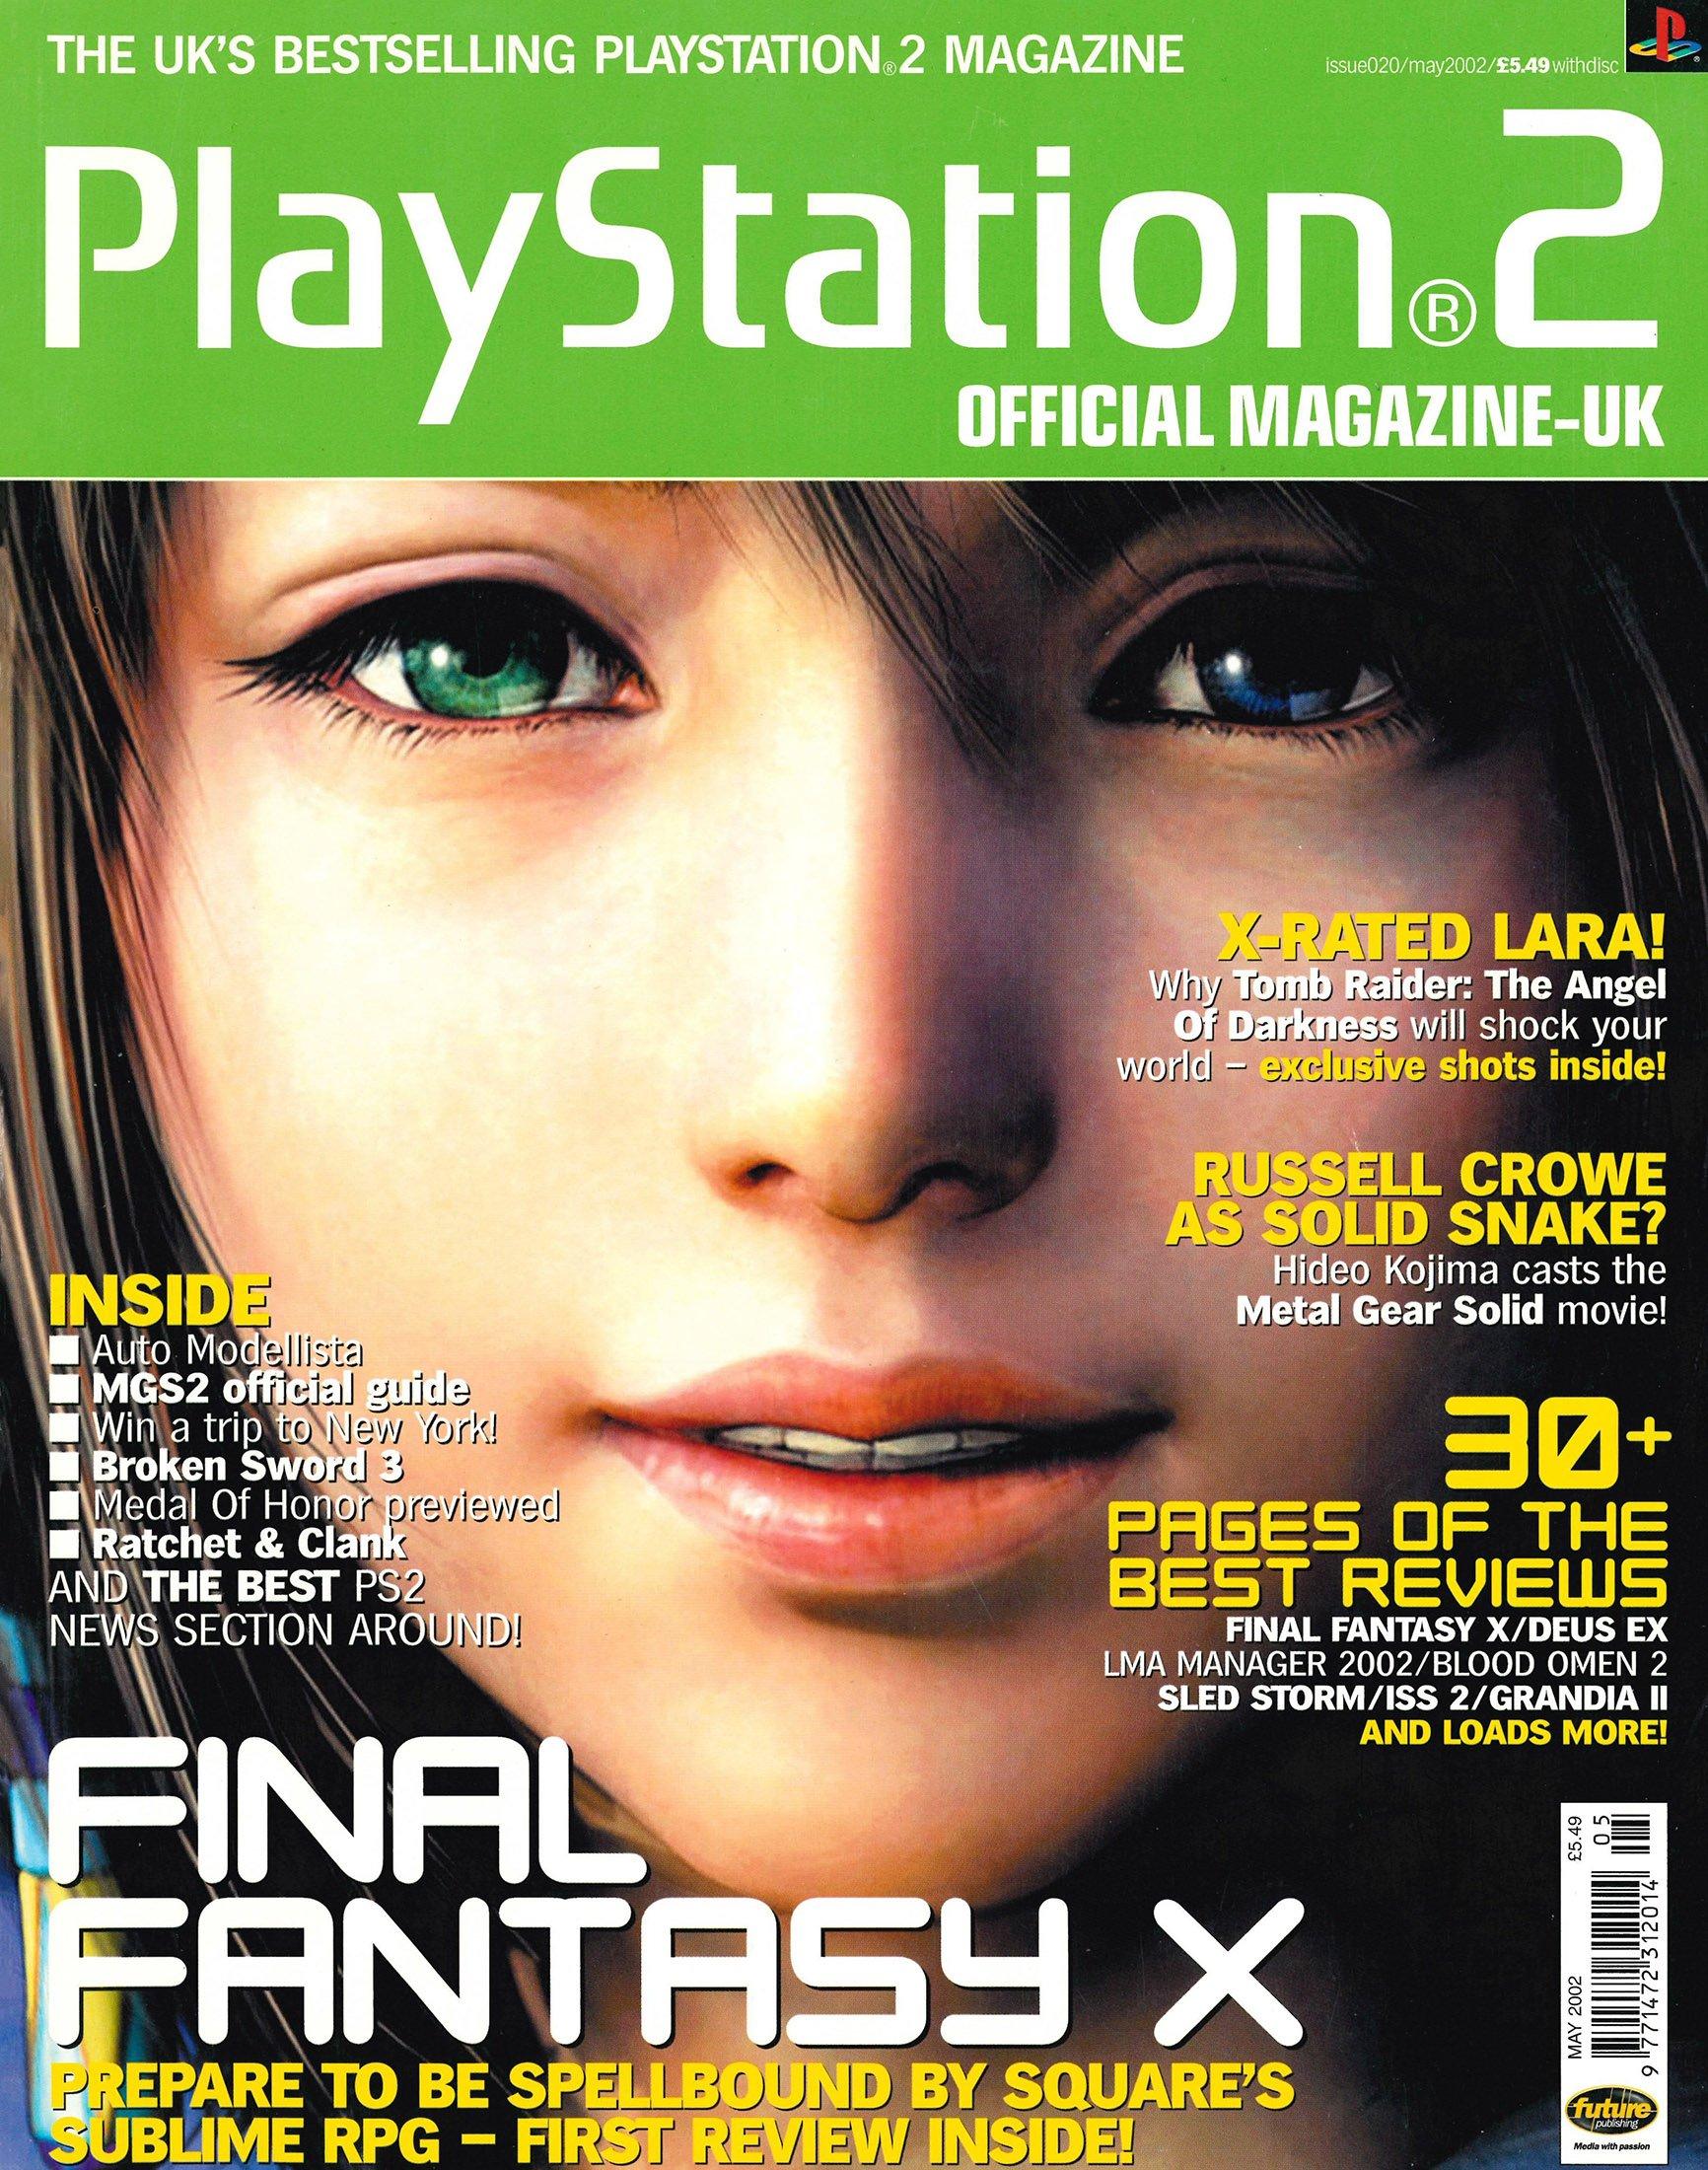 Official Playstation 2 Magazine UK 020 (May 2002)